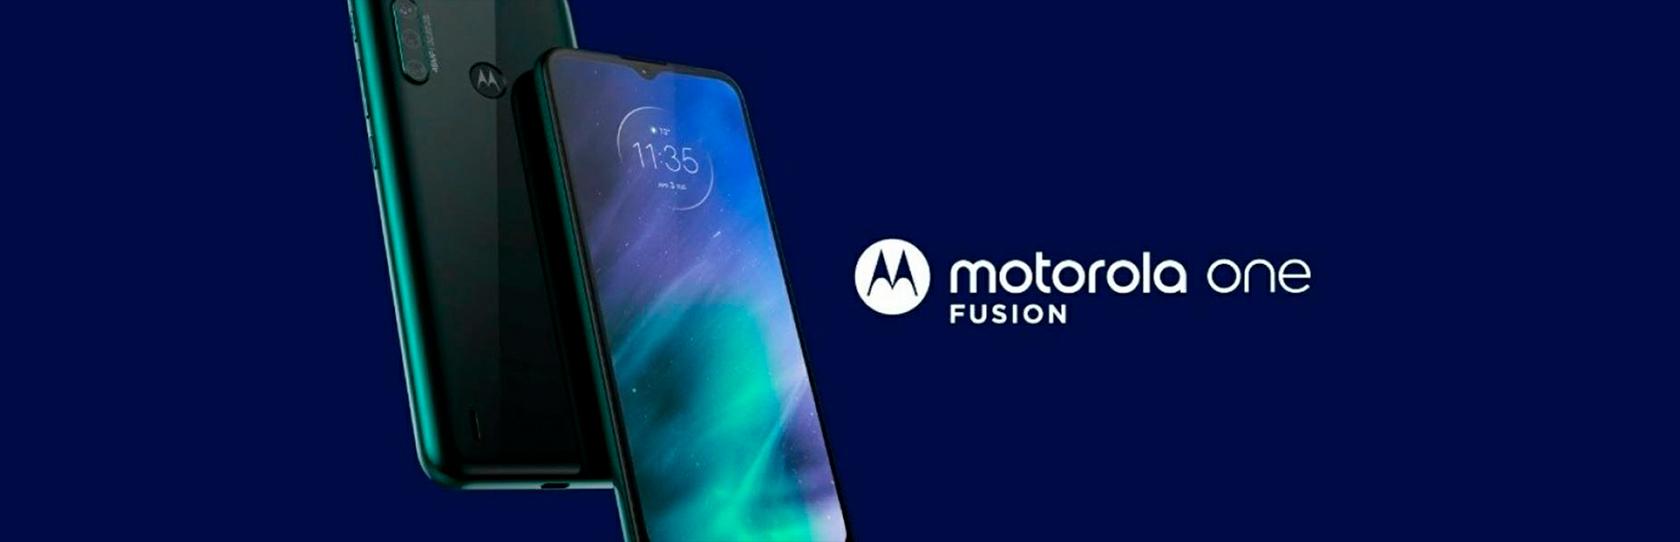 Celular Motorola One Fusion 128GB